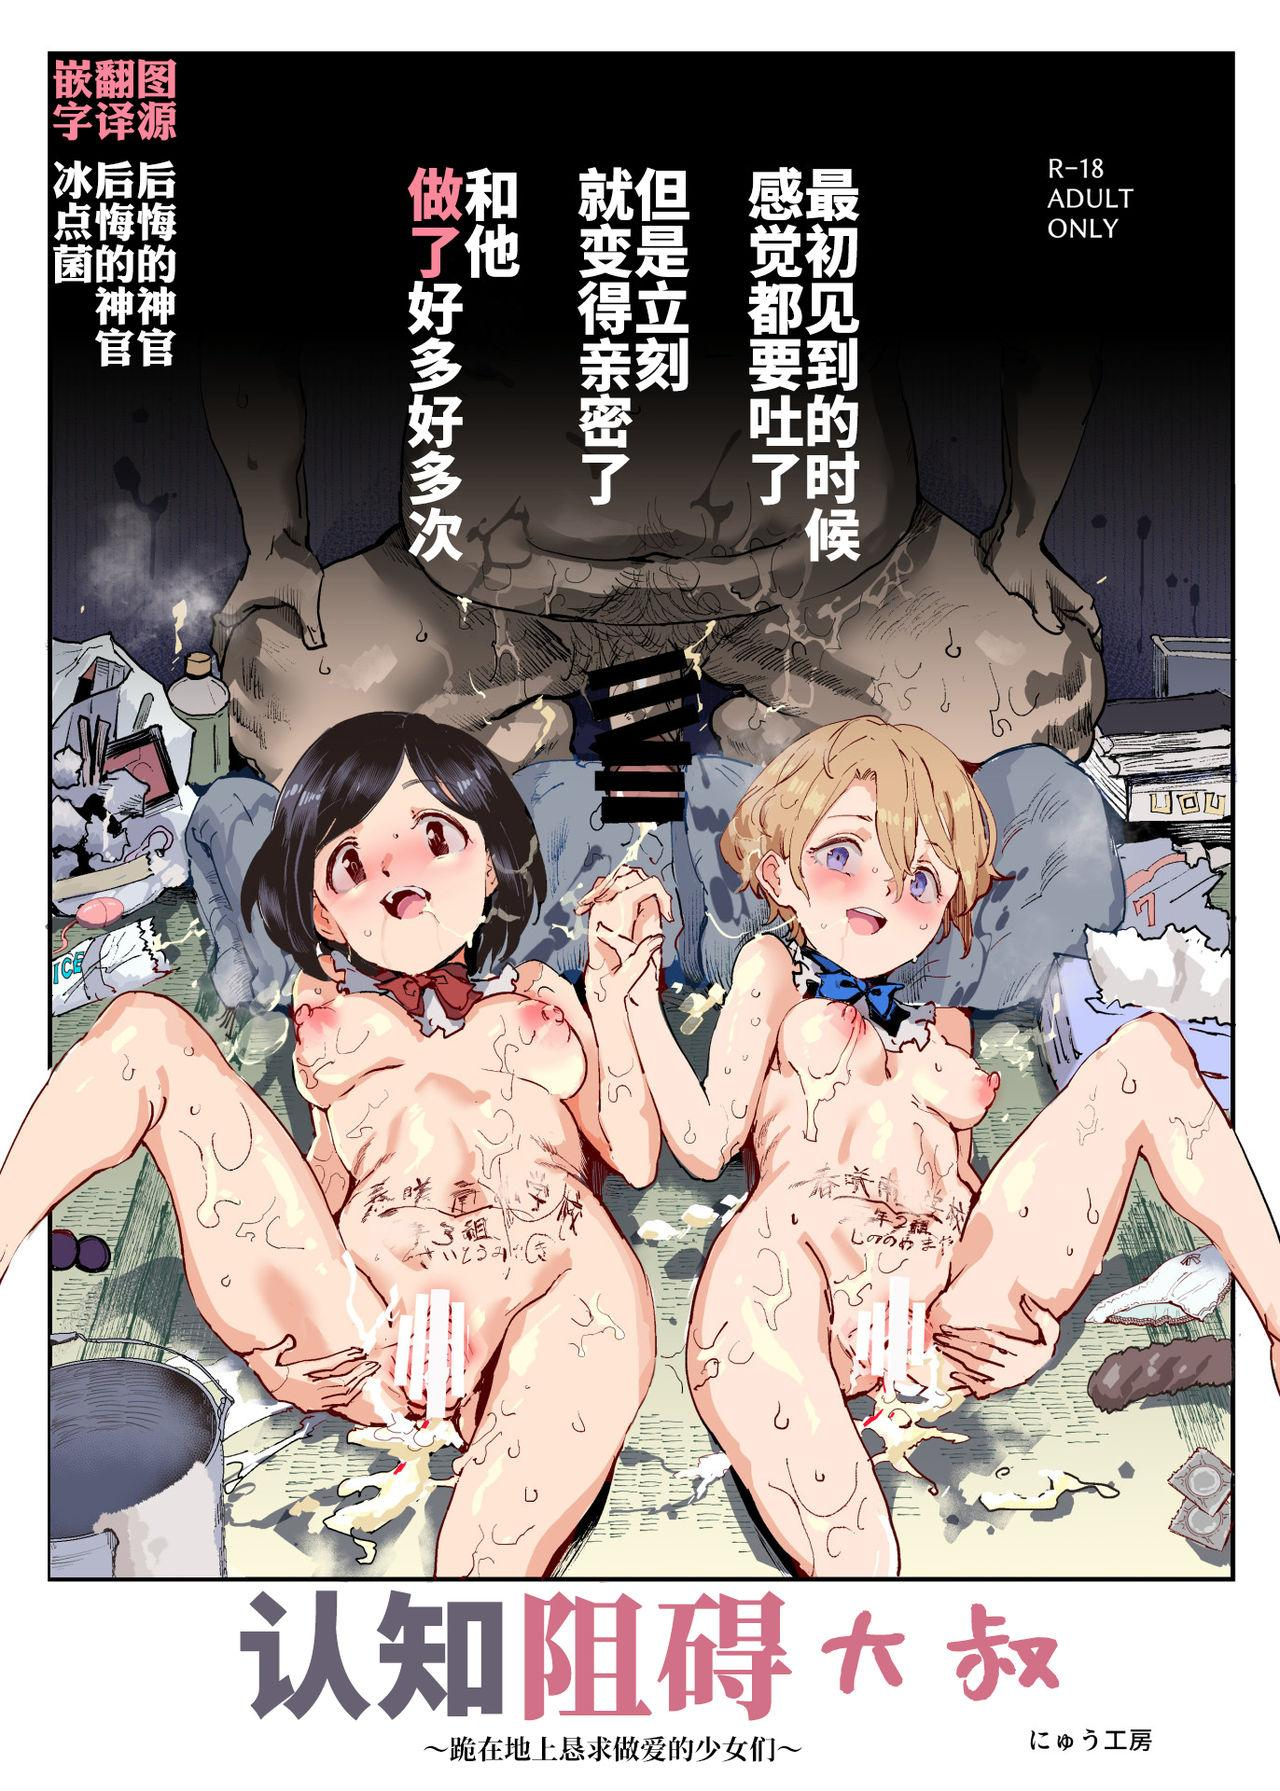 [Nyuu Koubou (Nyuu)] Ninshiki Sogai Oji-san ~Dogeza de Ecchi o Onegai suru Shoujo-tachi~ [Chinese] [神官冰点汉化] [Digital] 0